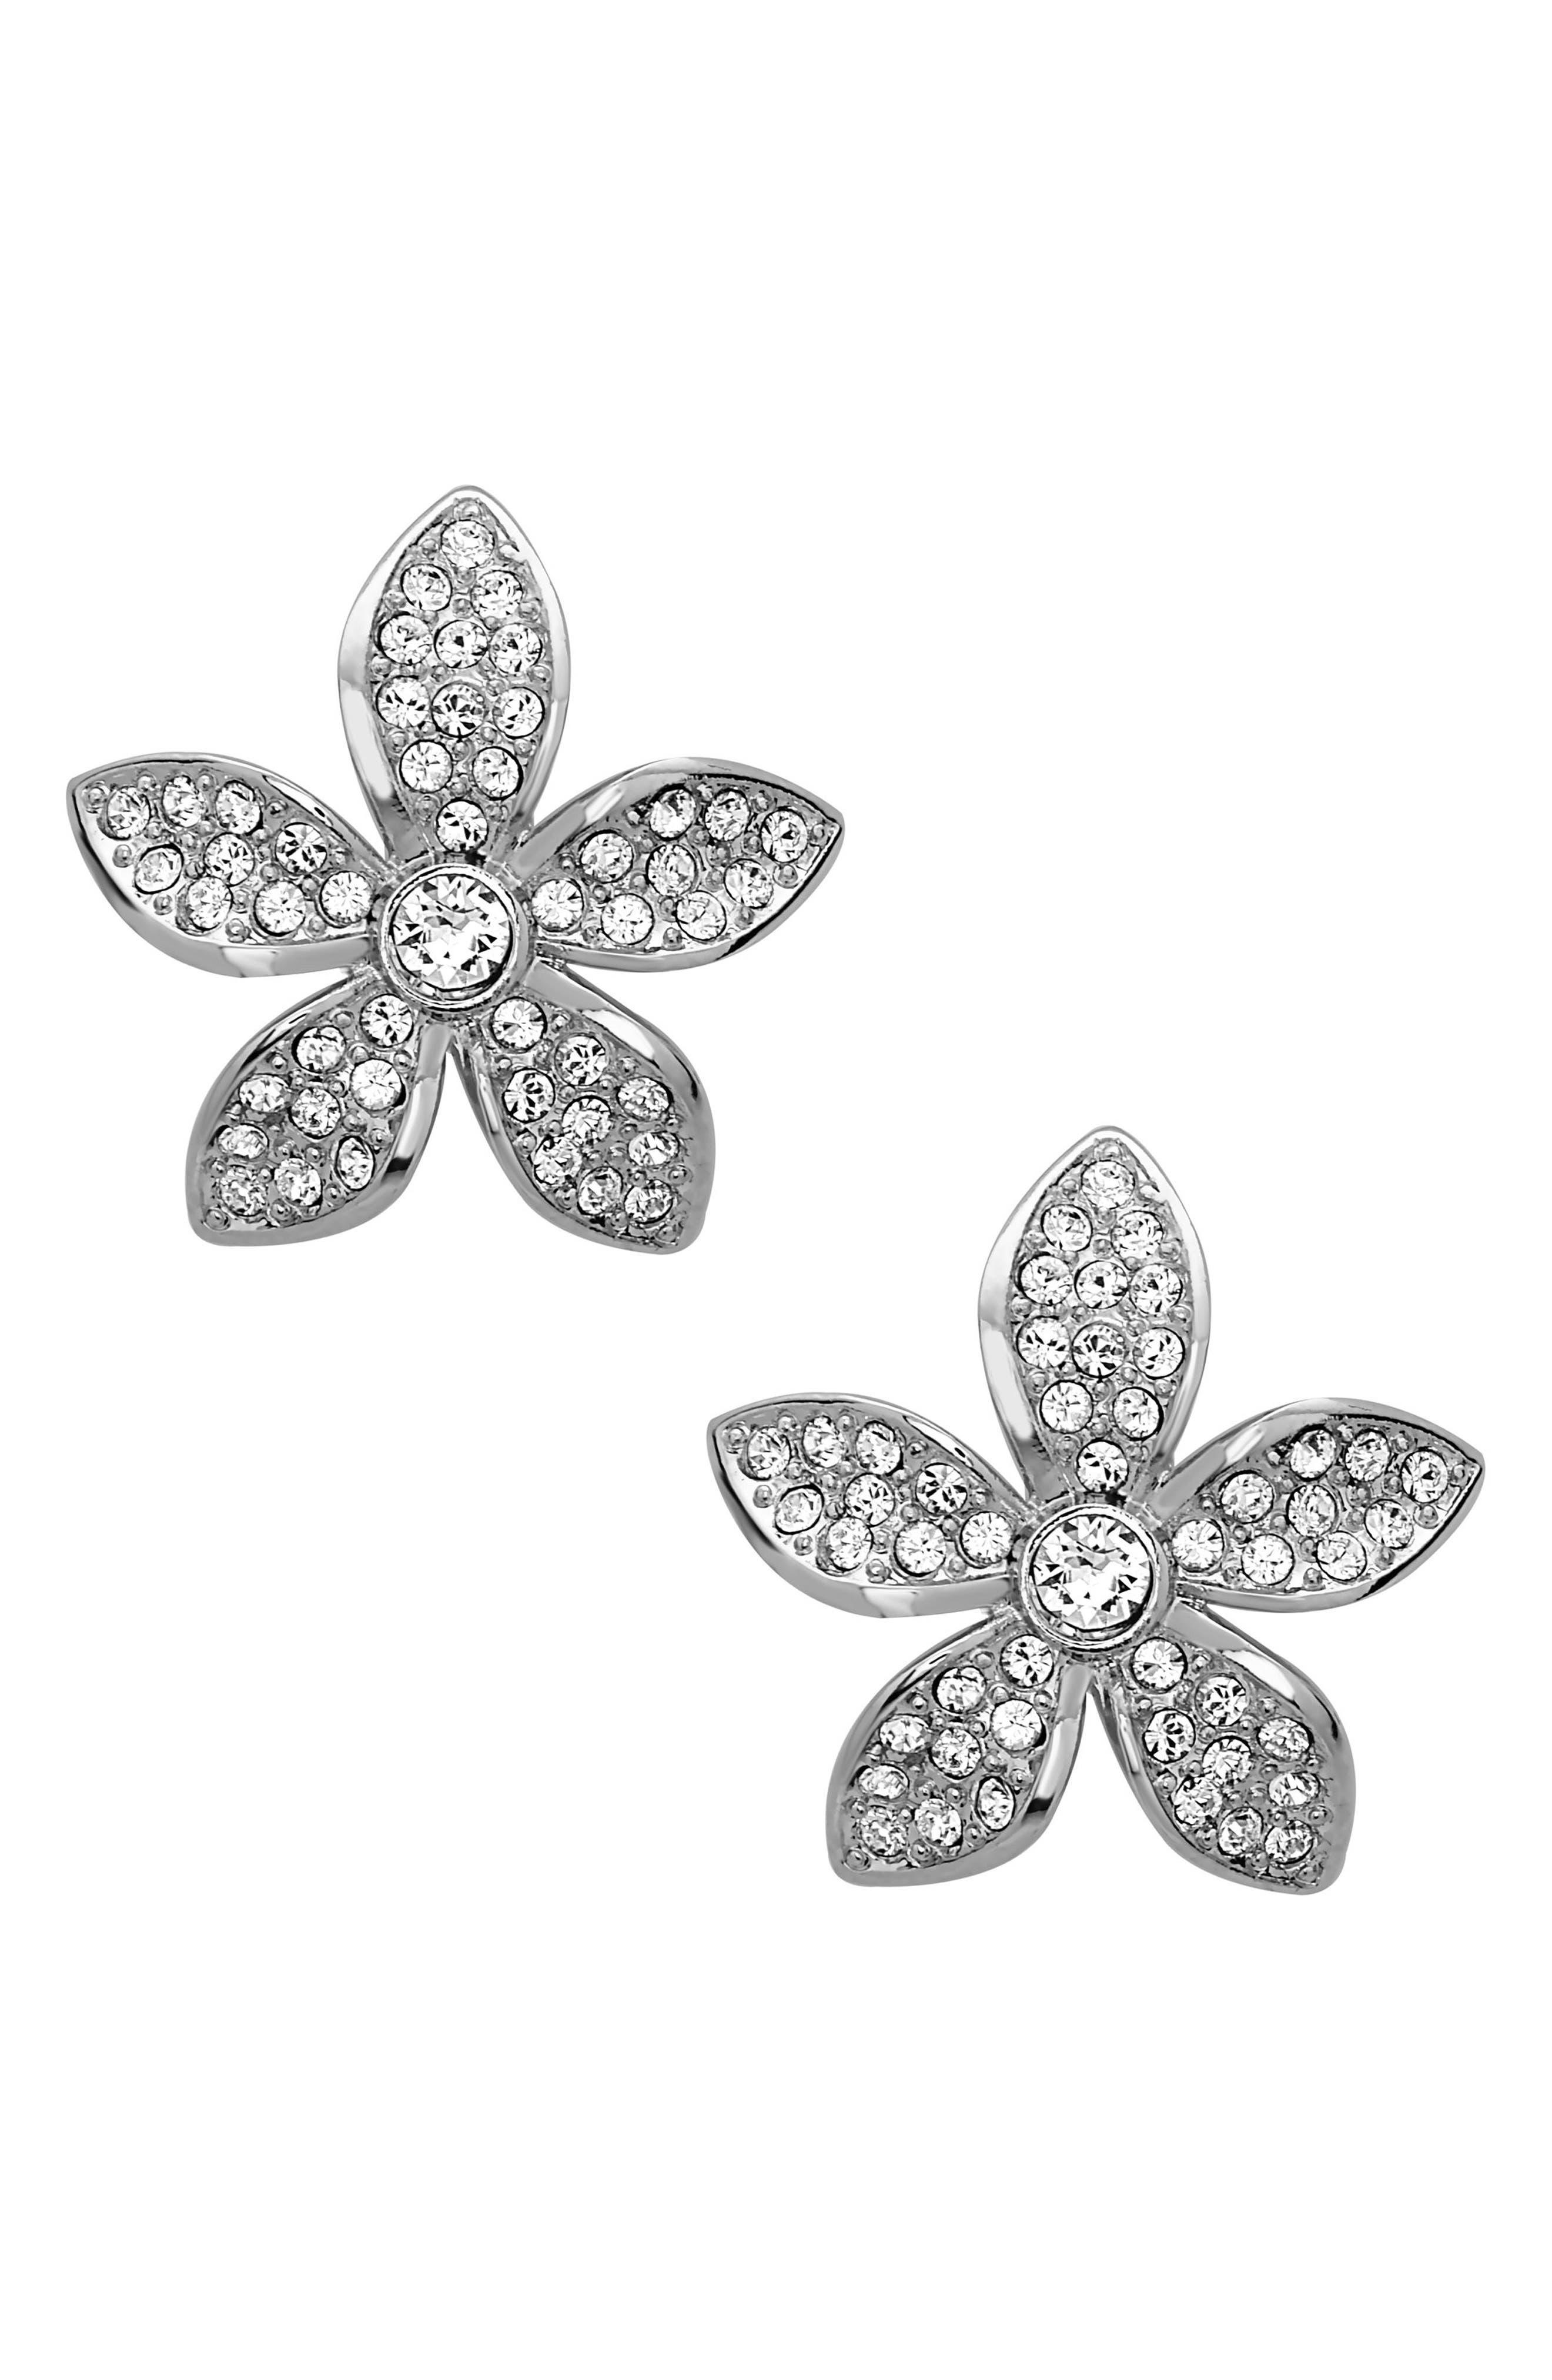 Main Image - Nina Floral Crystal Stud Earrings